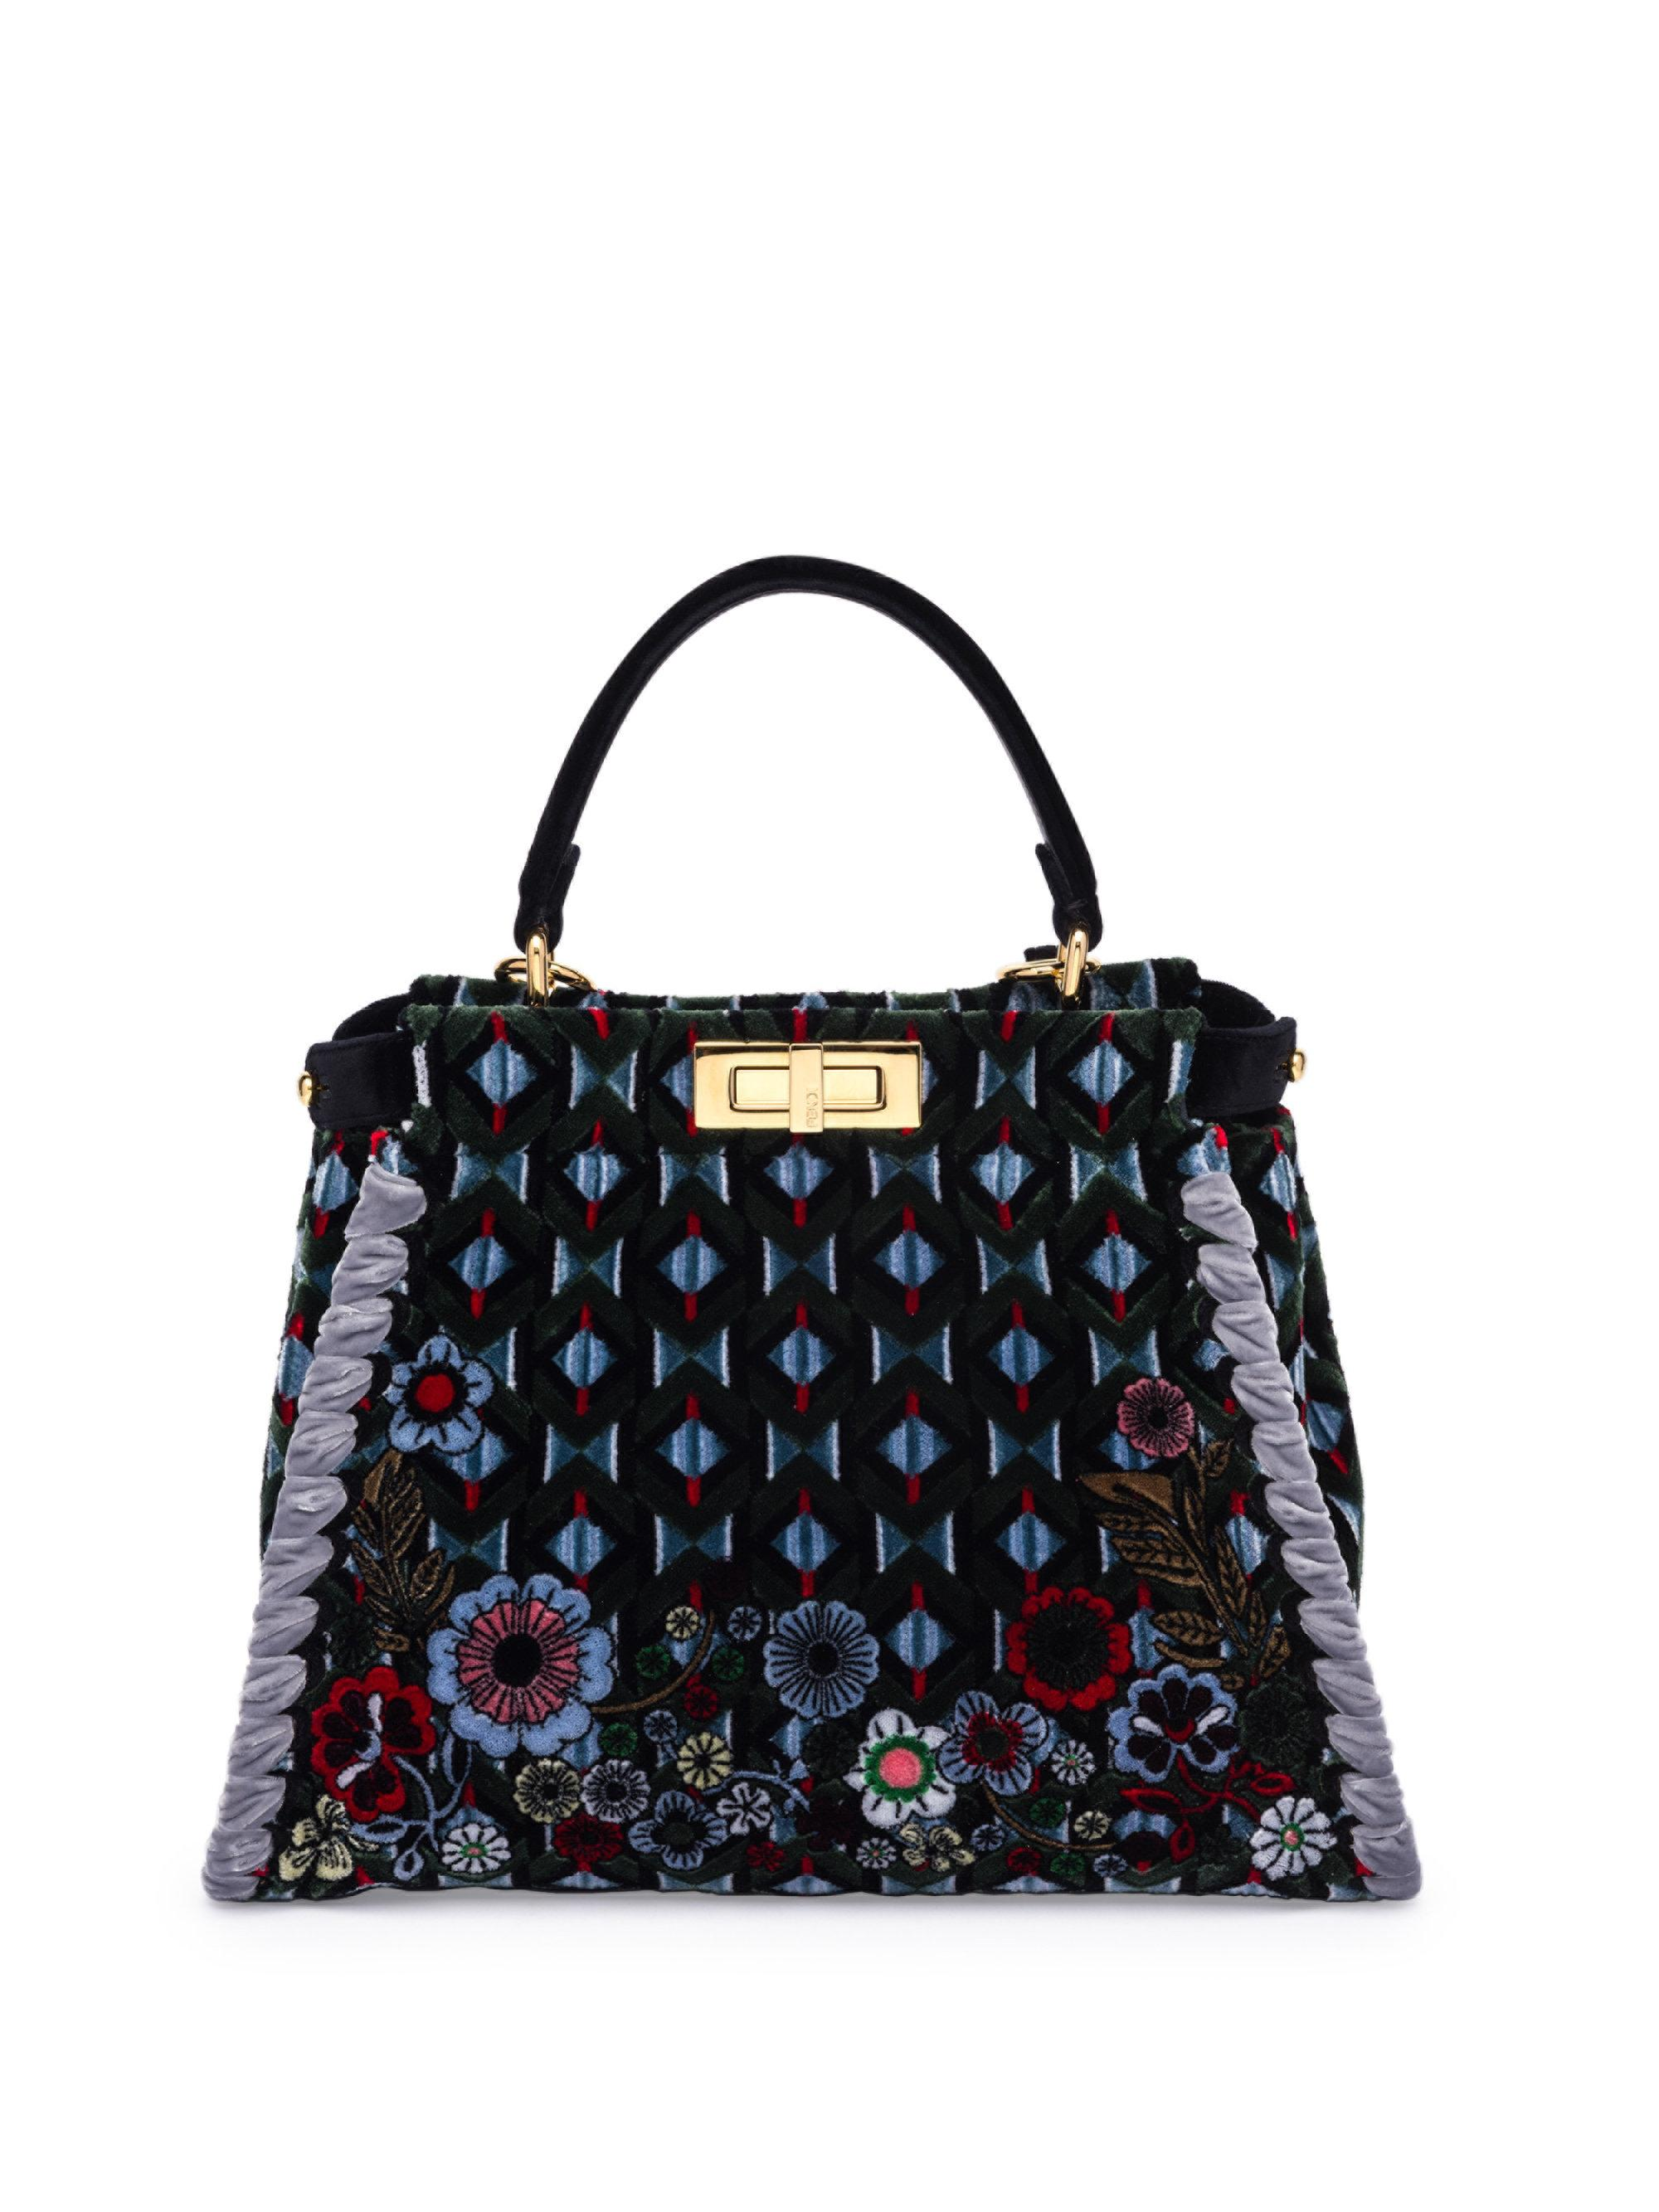 37f474a618b Lyst - Fendi Peekaboo Woven Embroidered Velvet Handbag